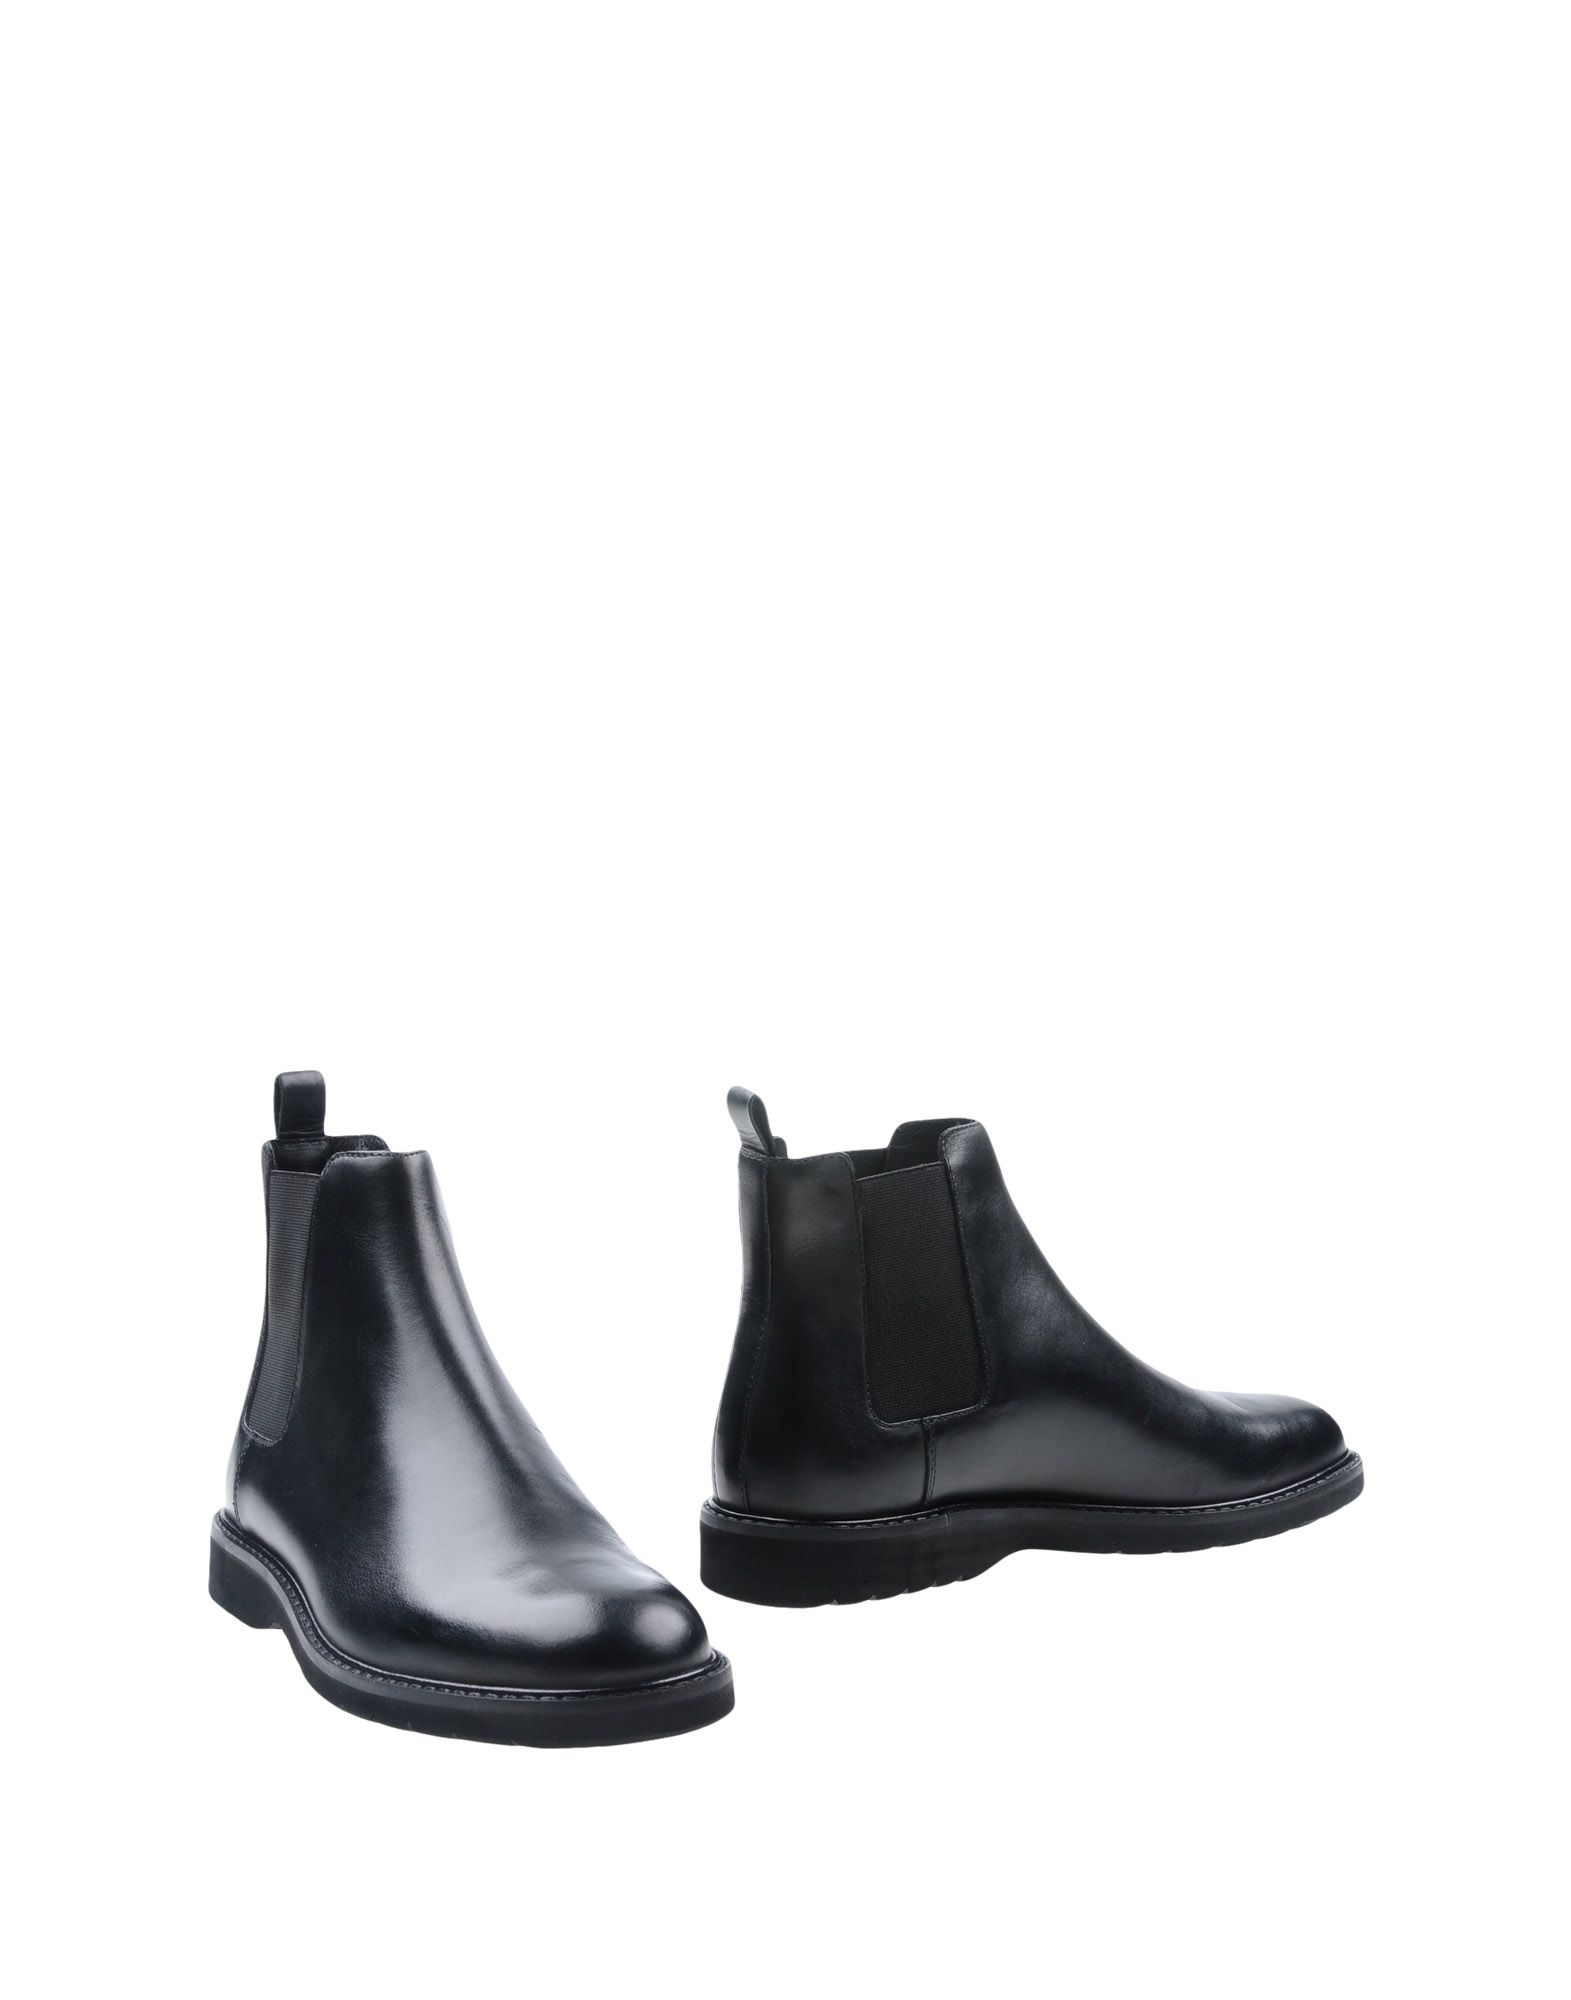 Rabatt echte Schuhe Schuhe echte Lumberjack Stiefelette Herren 11338234CR a31527